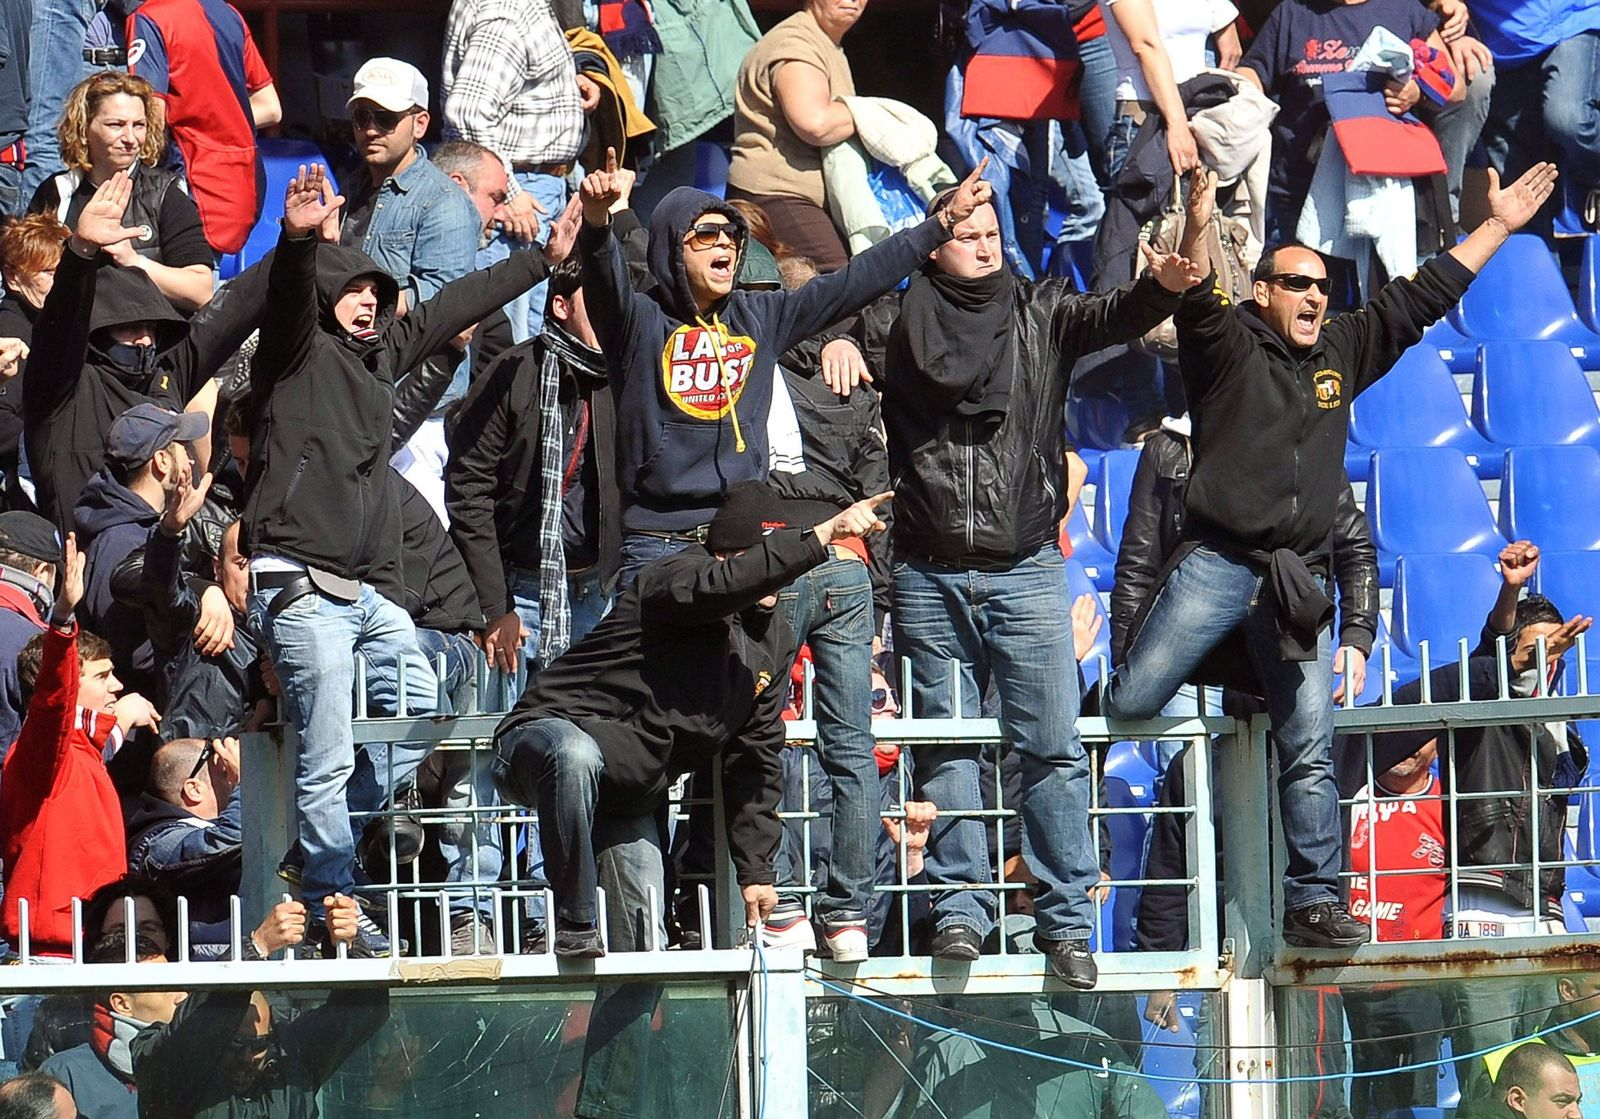 CFC Genoa 1893 vs AC Siena